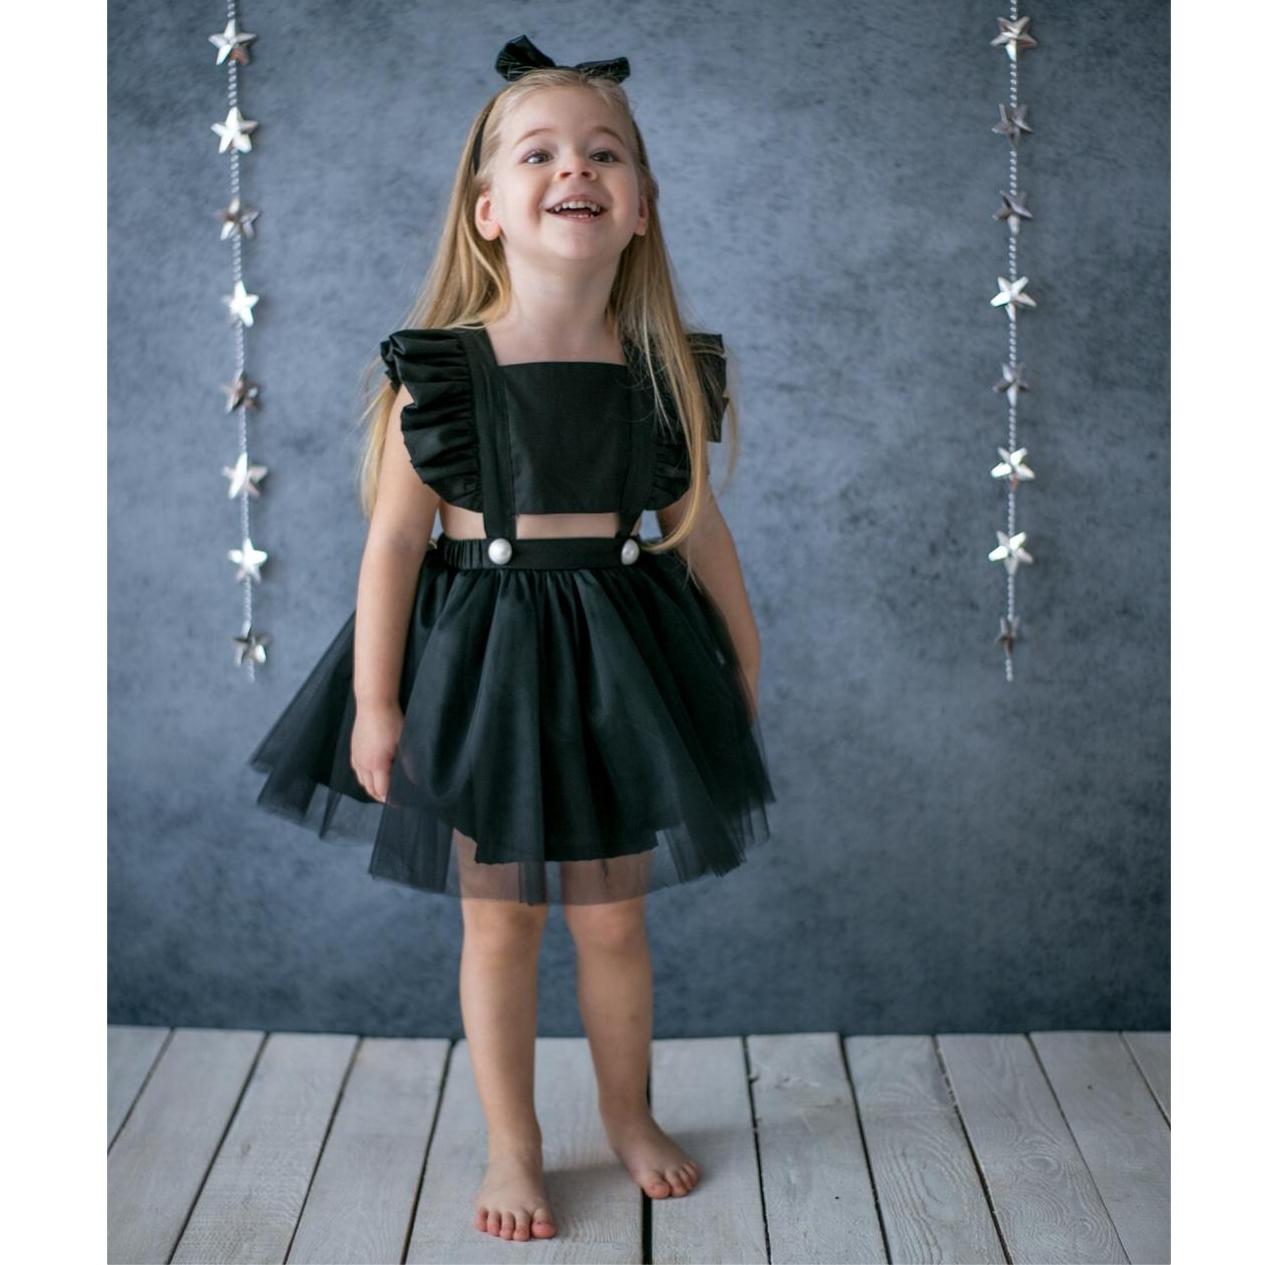 f7ecde9314c Μαύρο cut out παιδικό φόρεμα Pixy Love με ανοιχτή πλάτη.